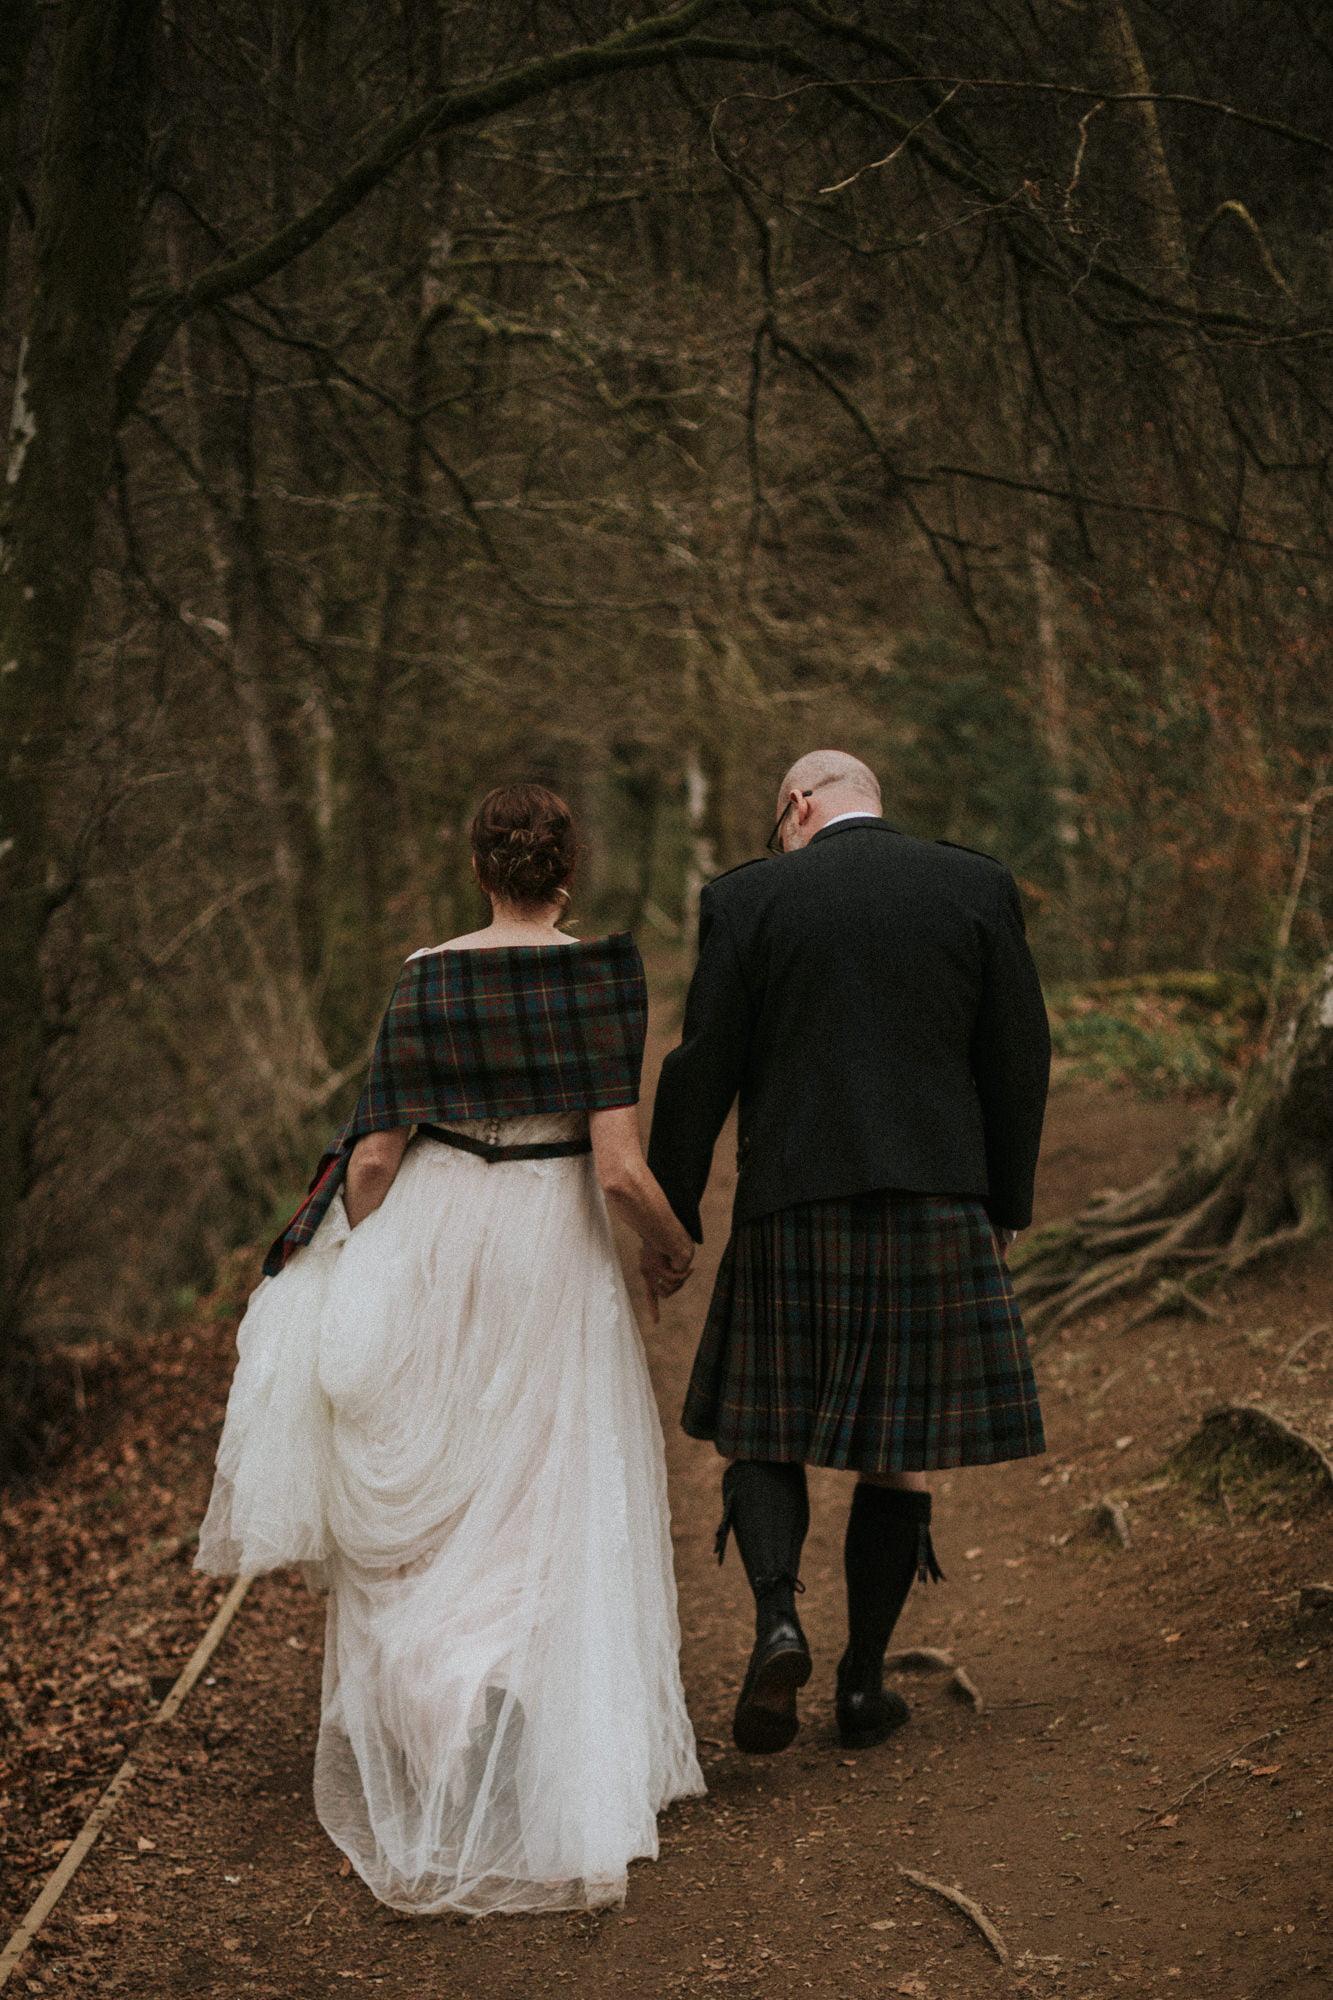 Spring Scotland Forest elopement Scotland, Dunkeld The Hermitage Elopement Photographer, Perthshire elopement photographer